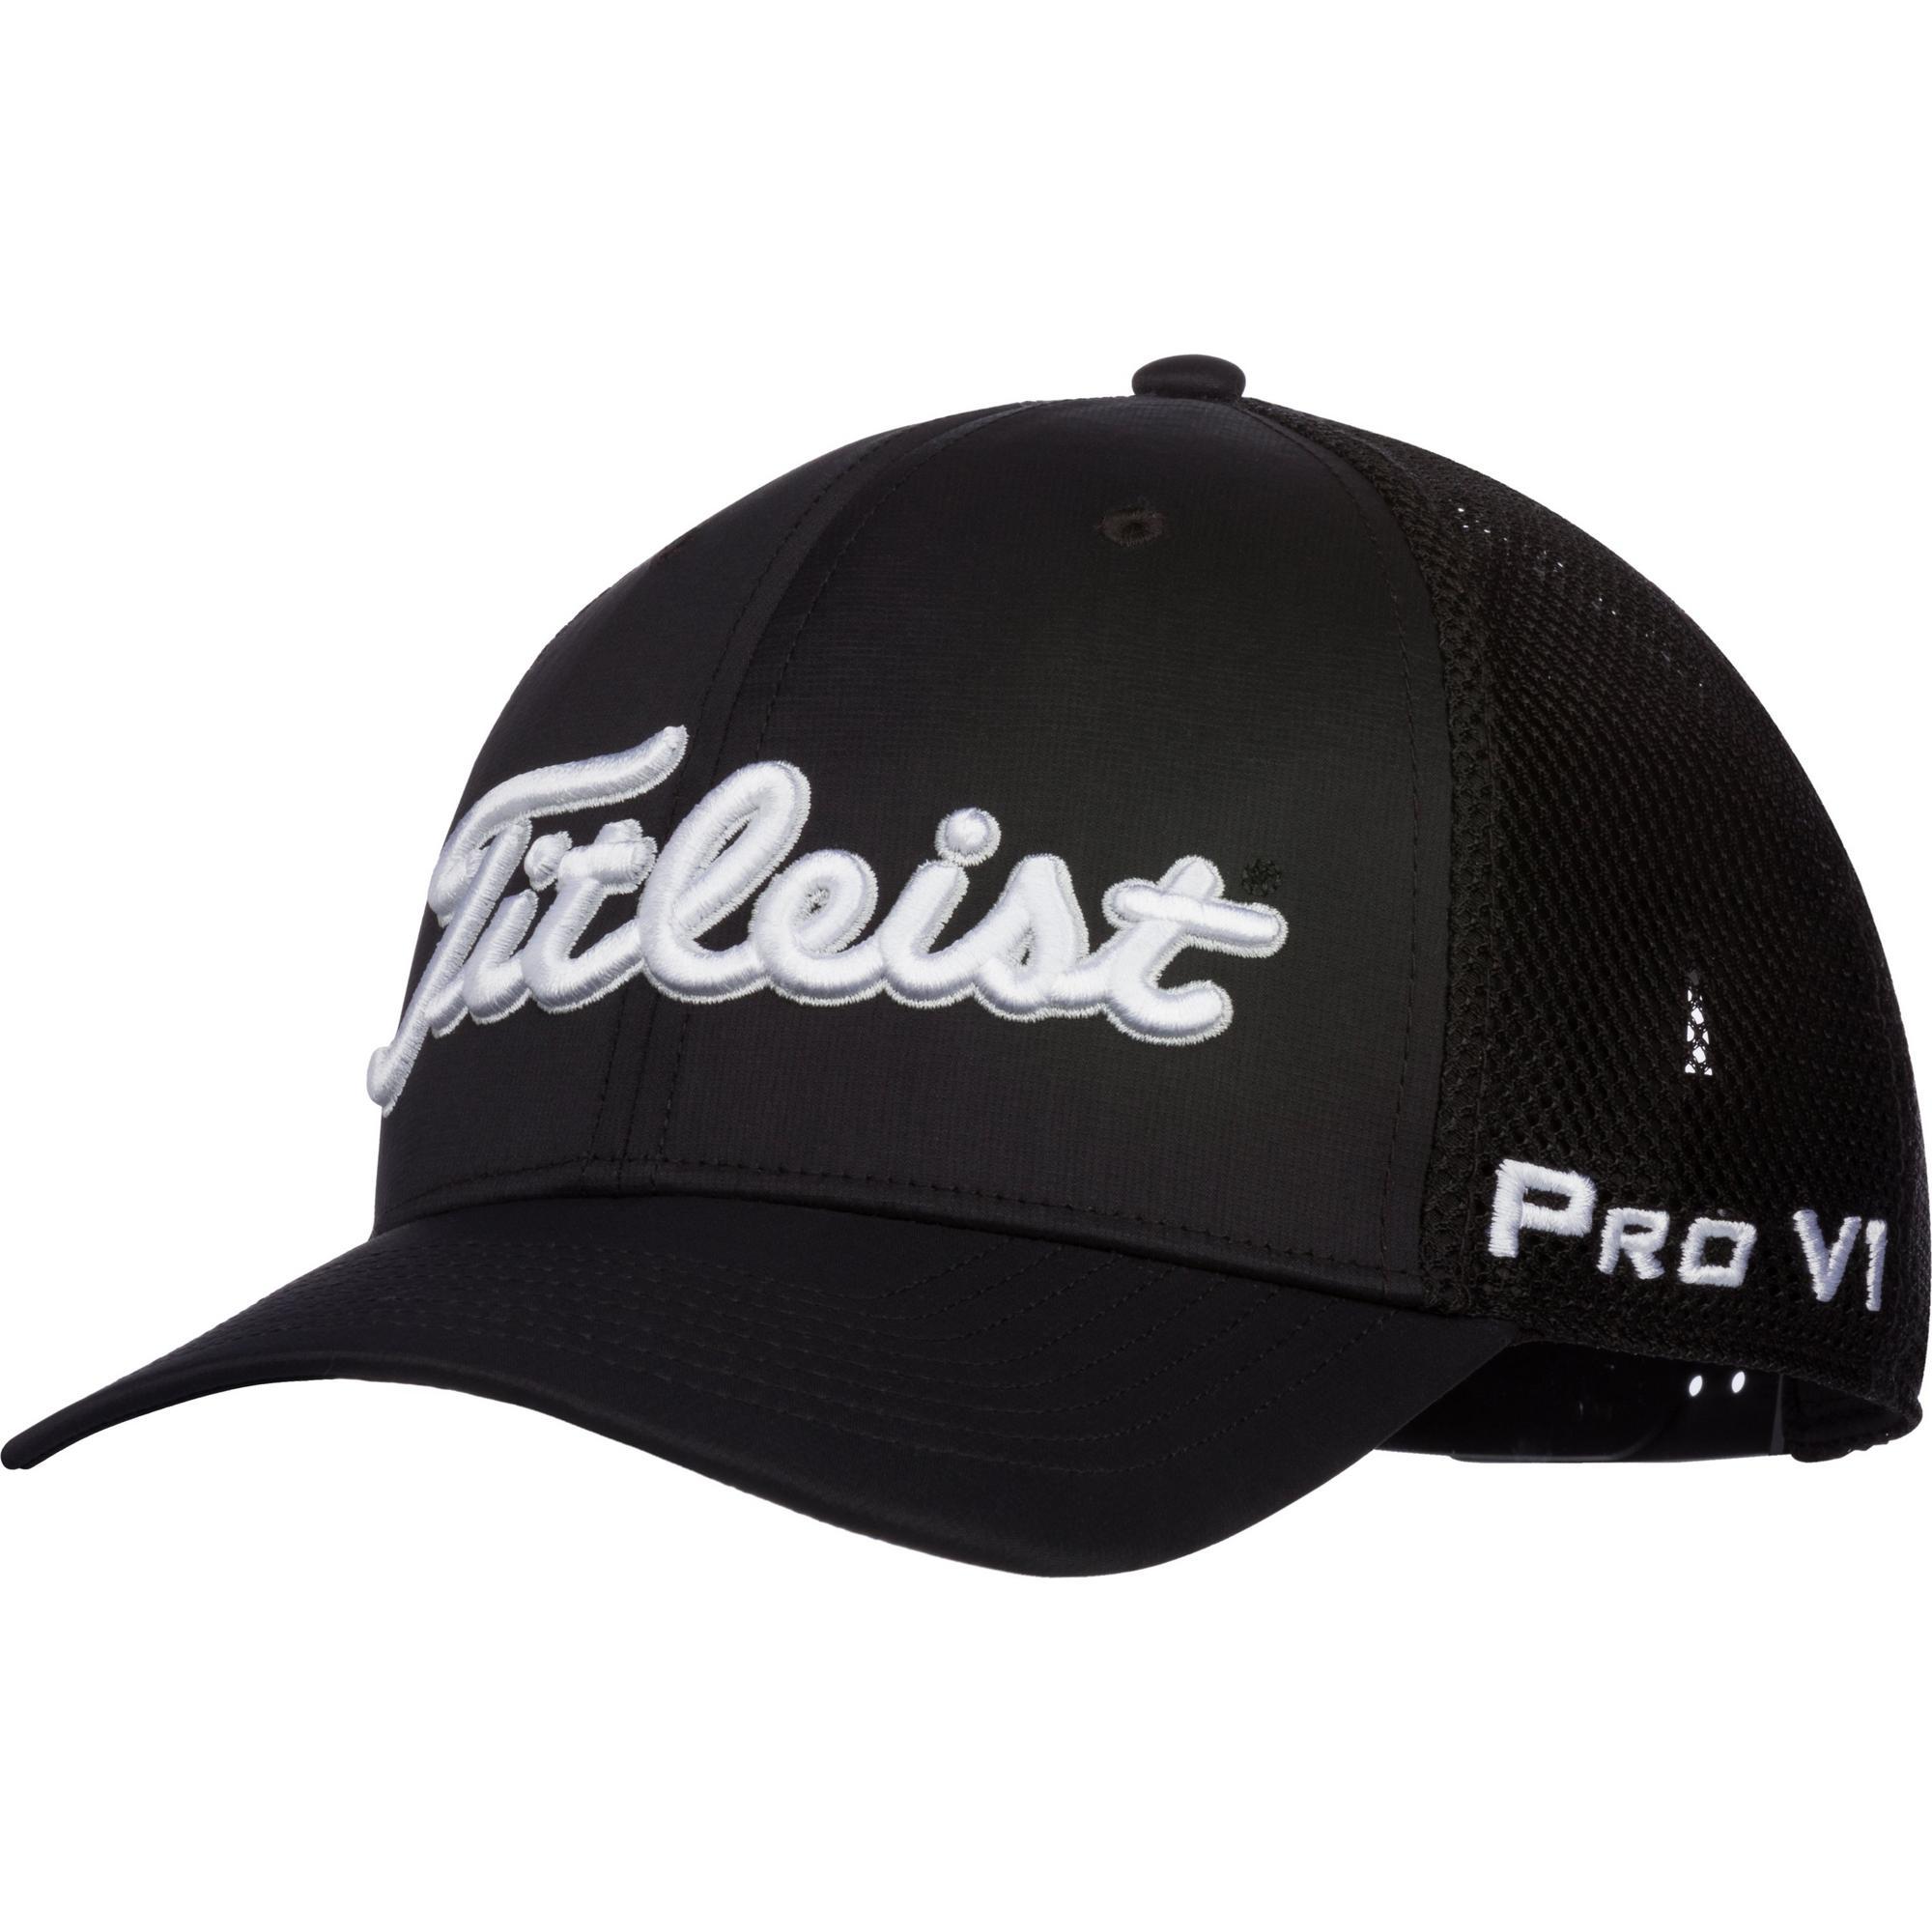 Men's Tour Snapback Mesh Cap